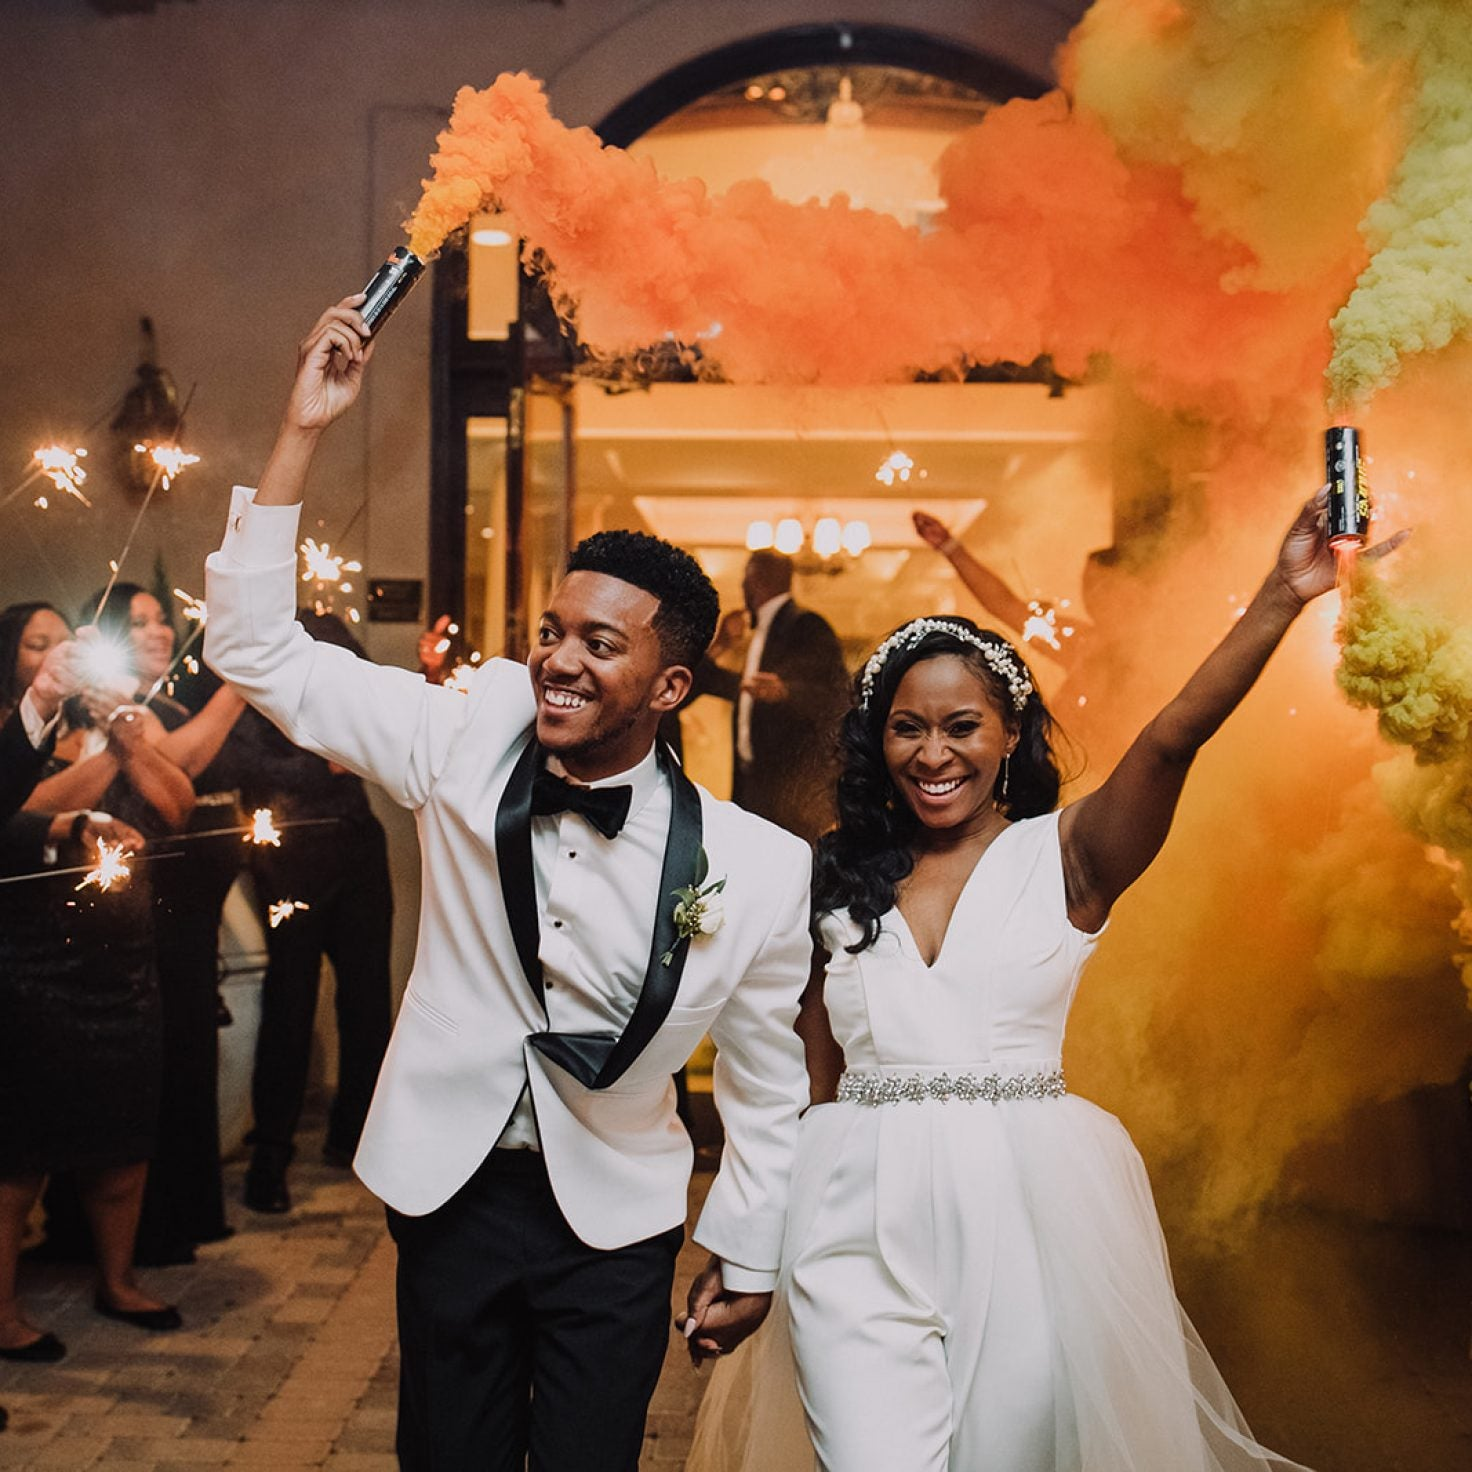 Bridal Bliss: Ashley And Brandon's North Carolina Wedding Had ALL The Southern Charm